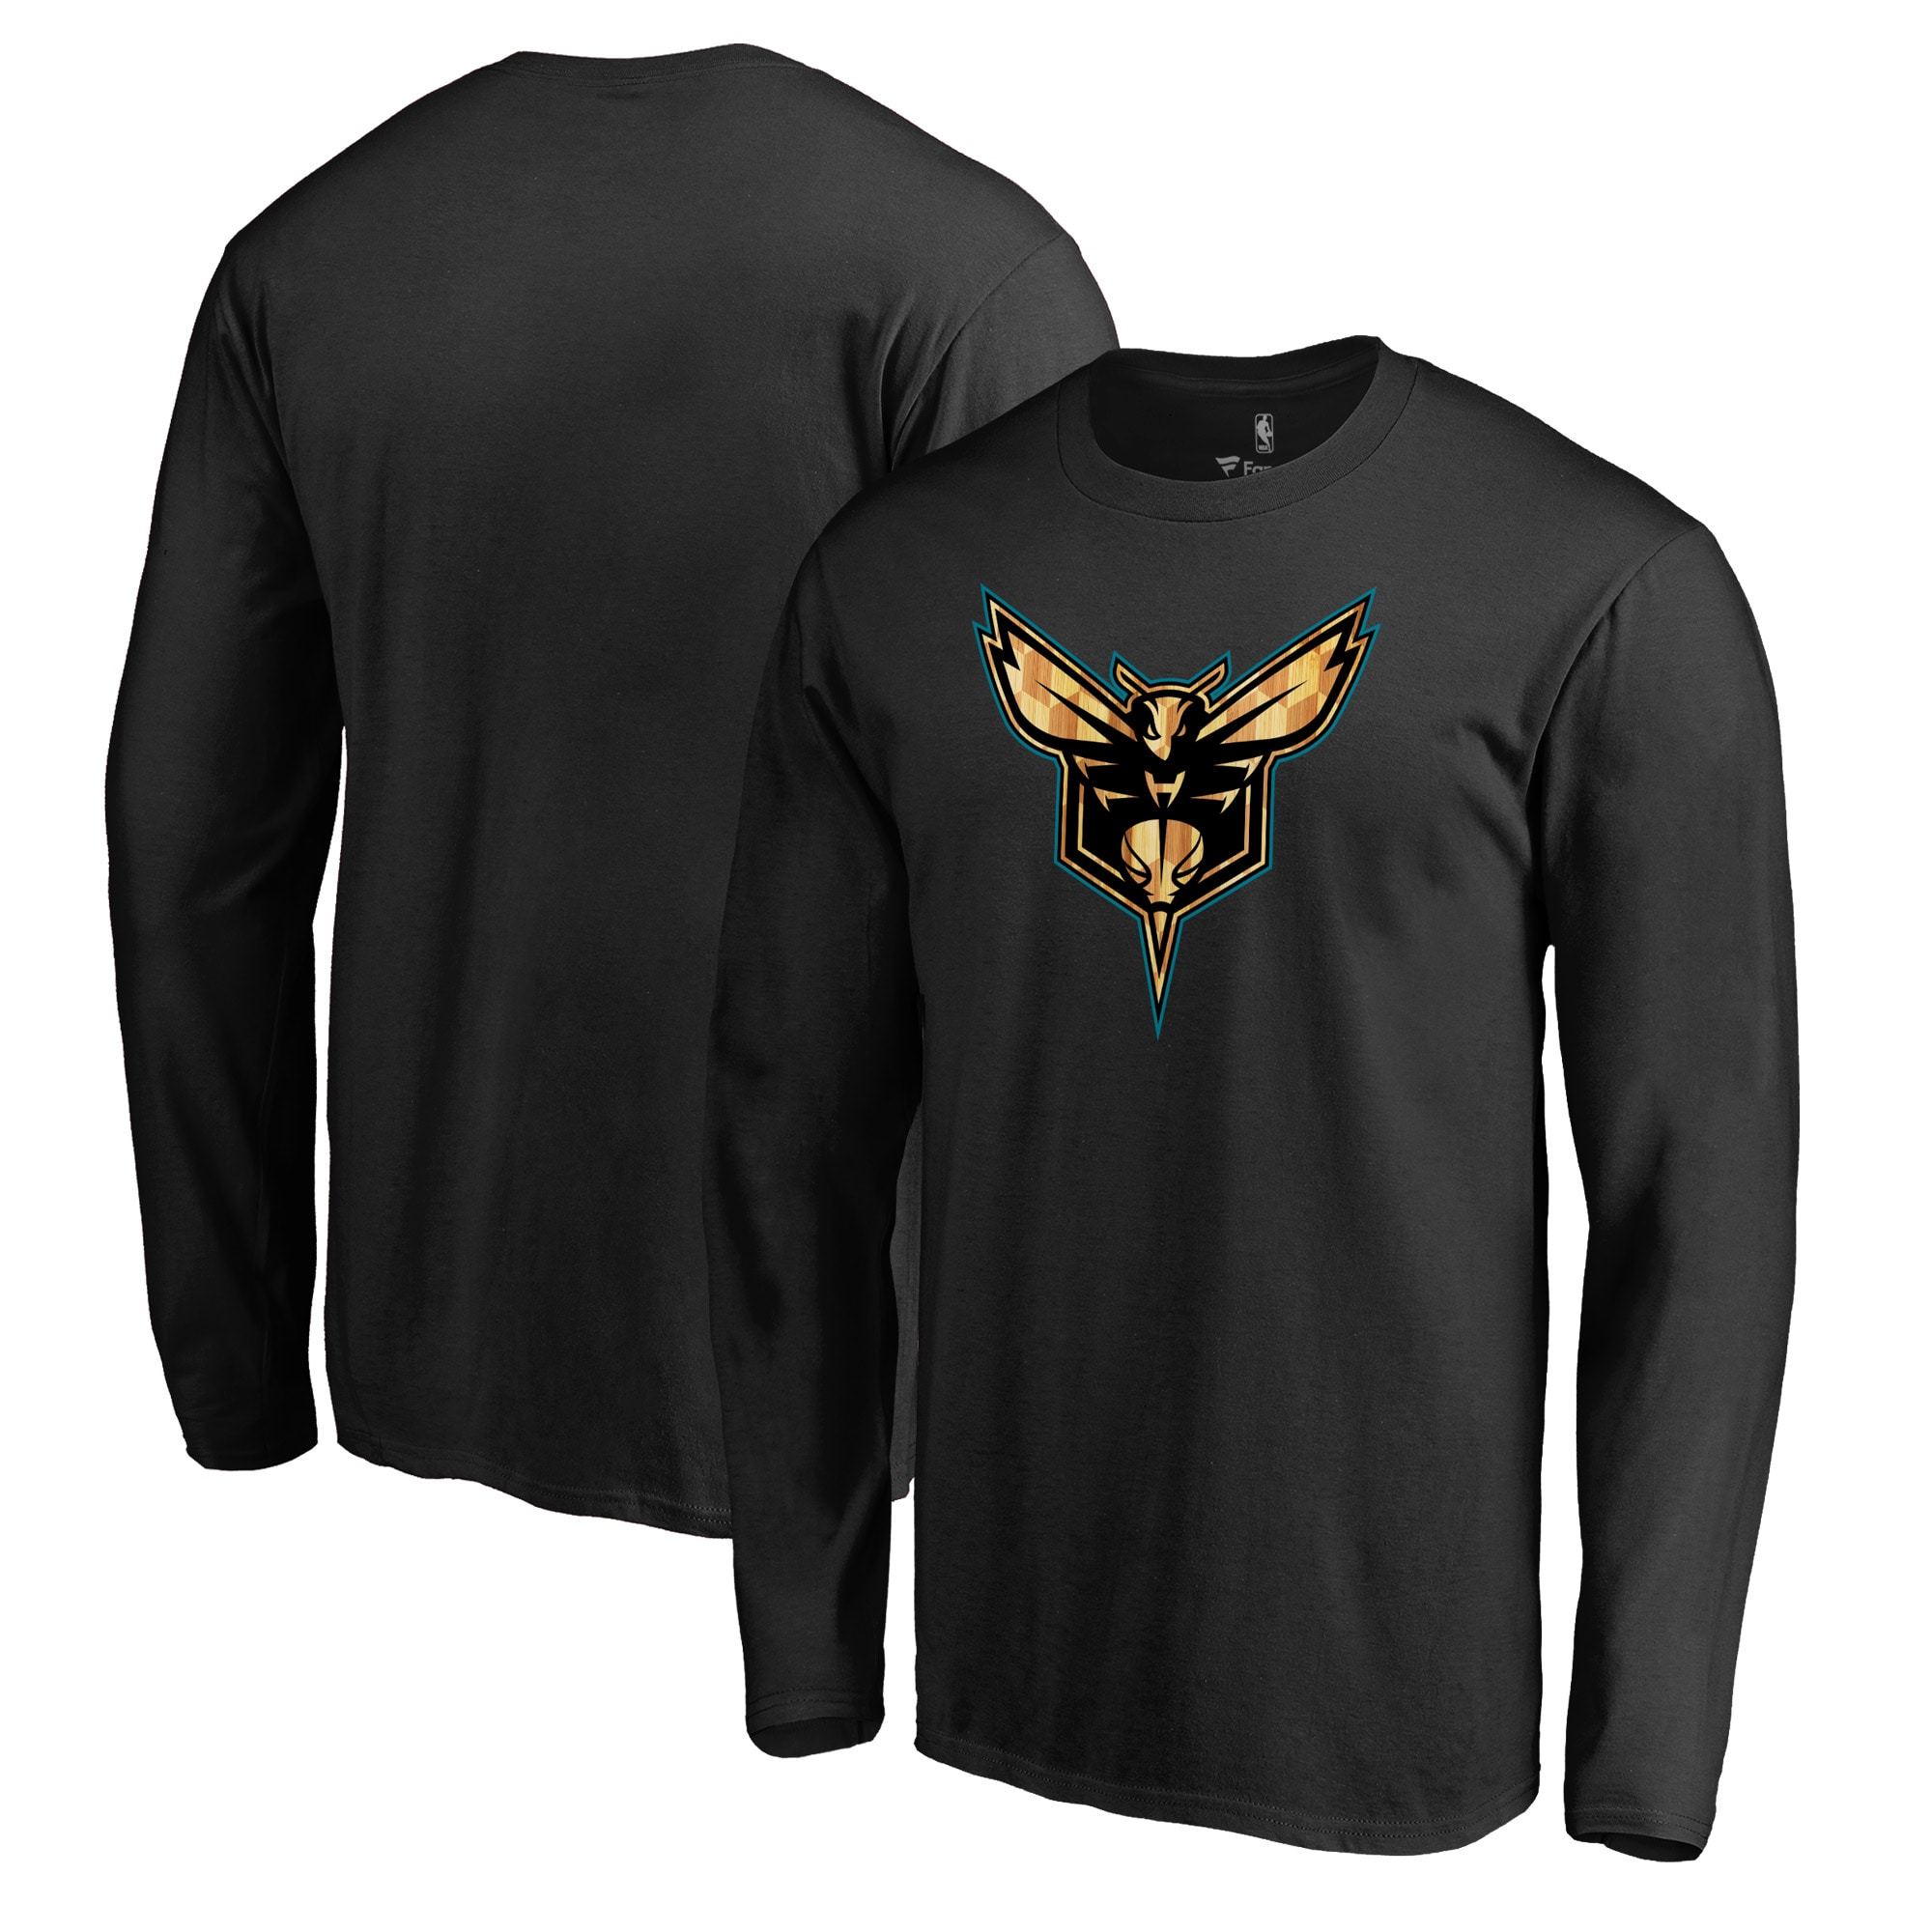 Charlotte Hornets Fanatics Branded Hardwood Long Sleeve T-Shirt - Black